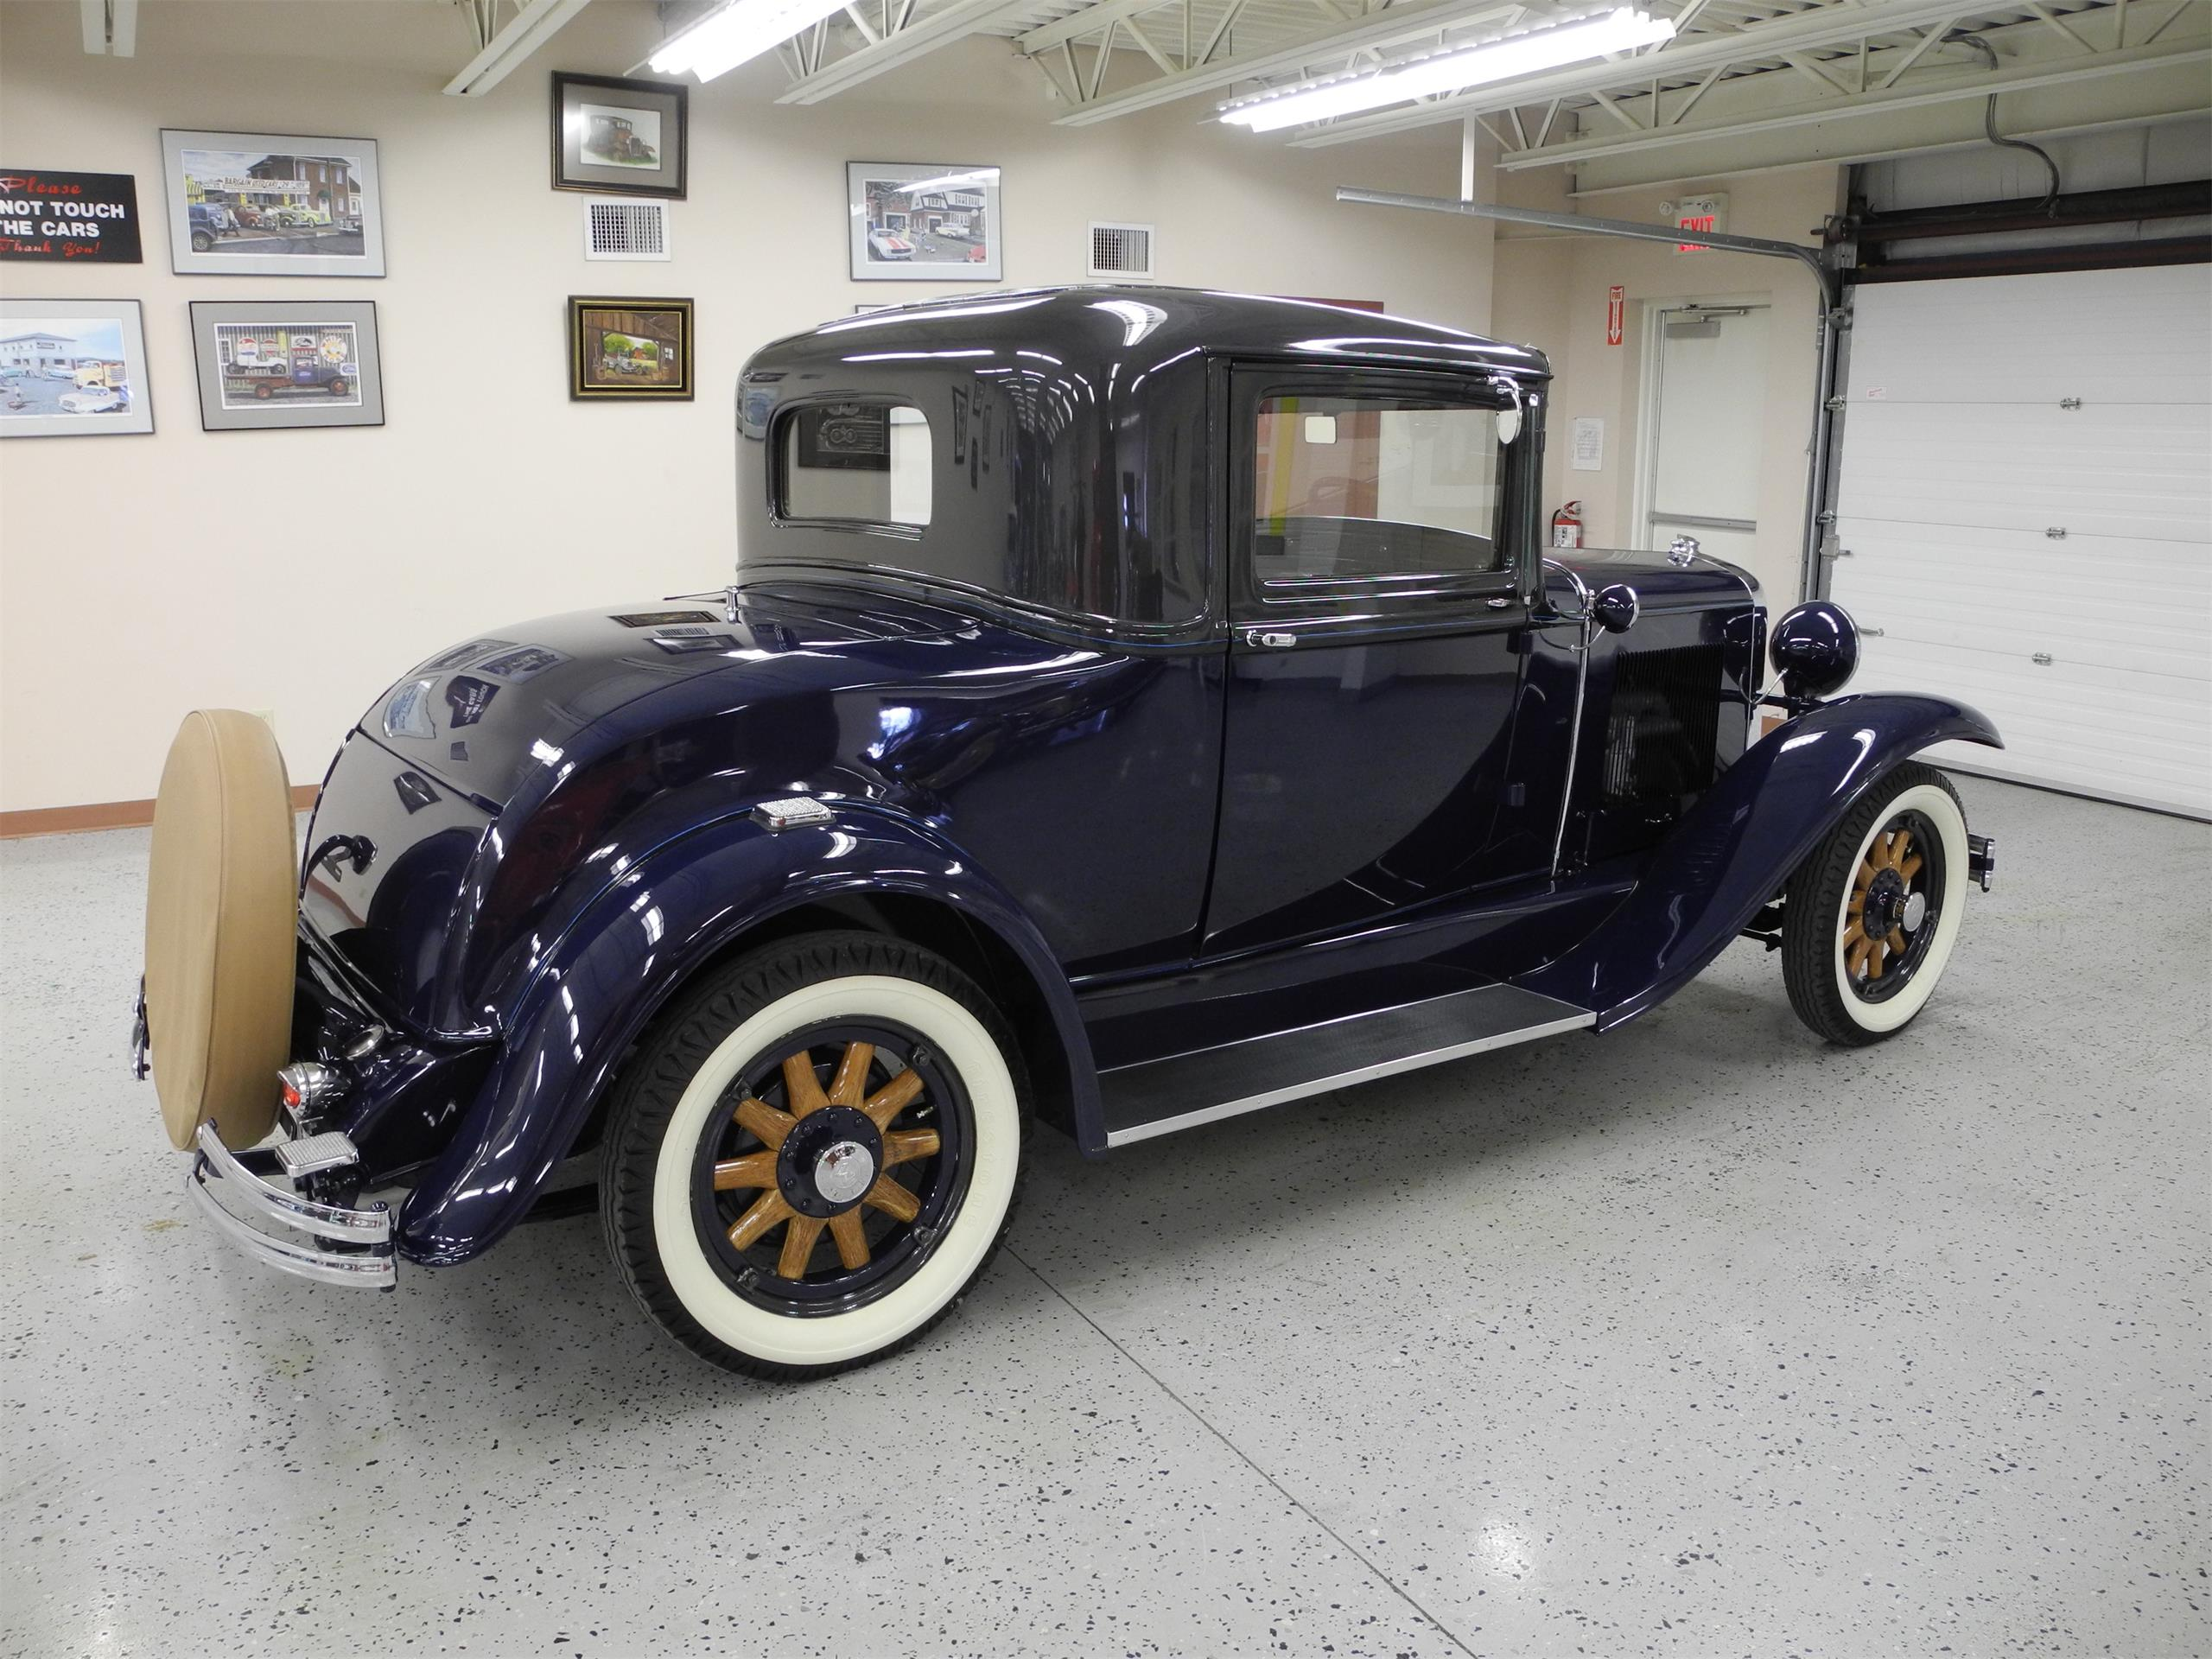 Need A Car Sudbury >> 1930 Buick Coupe for Sale | ClassicCars.com | CC-1039778